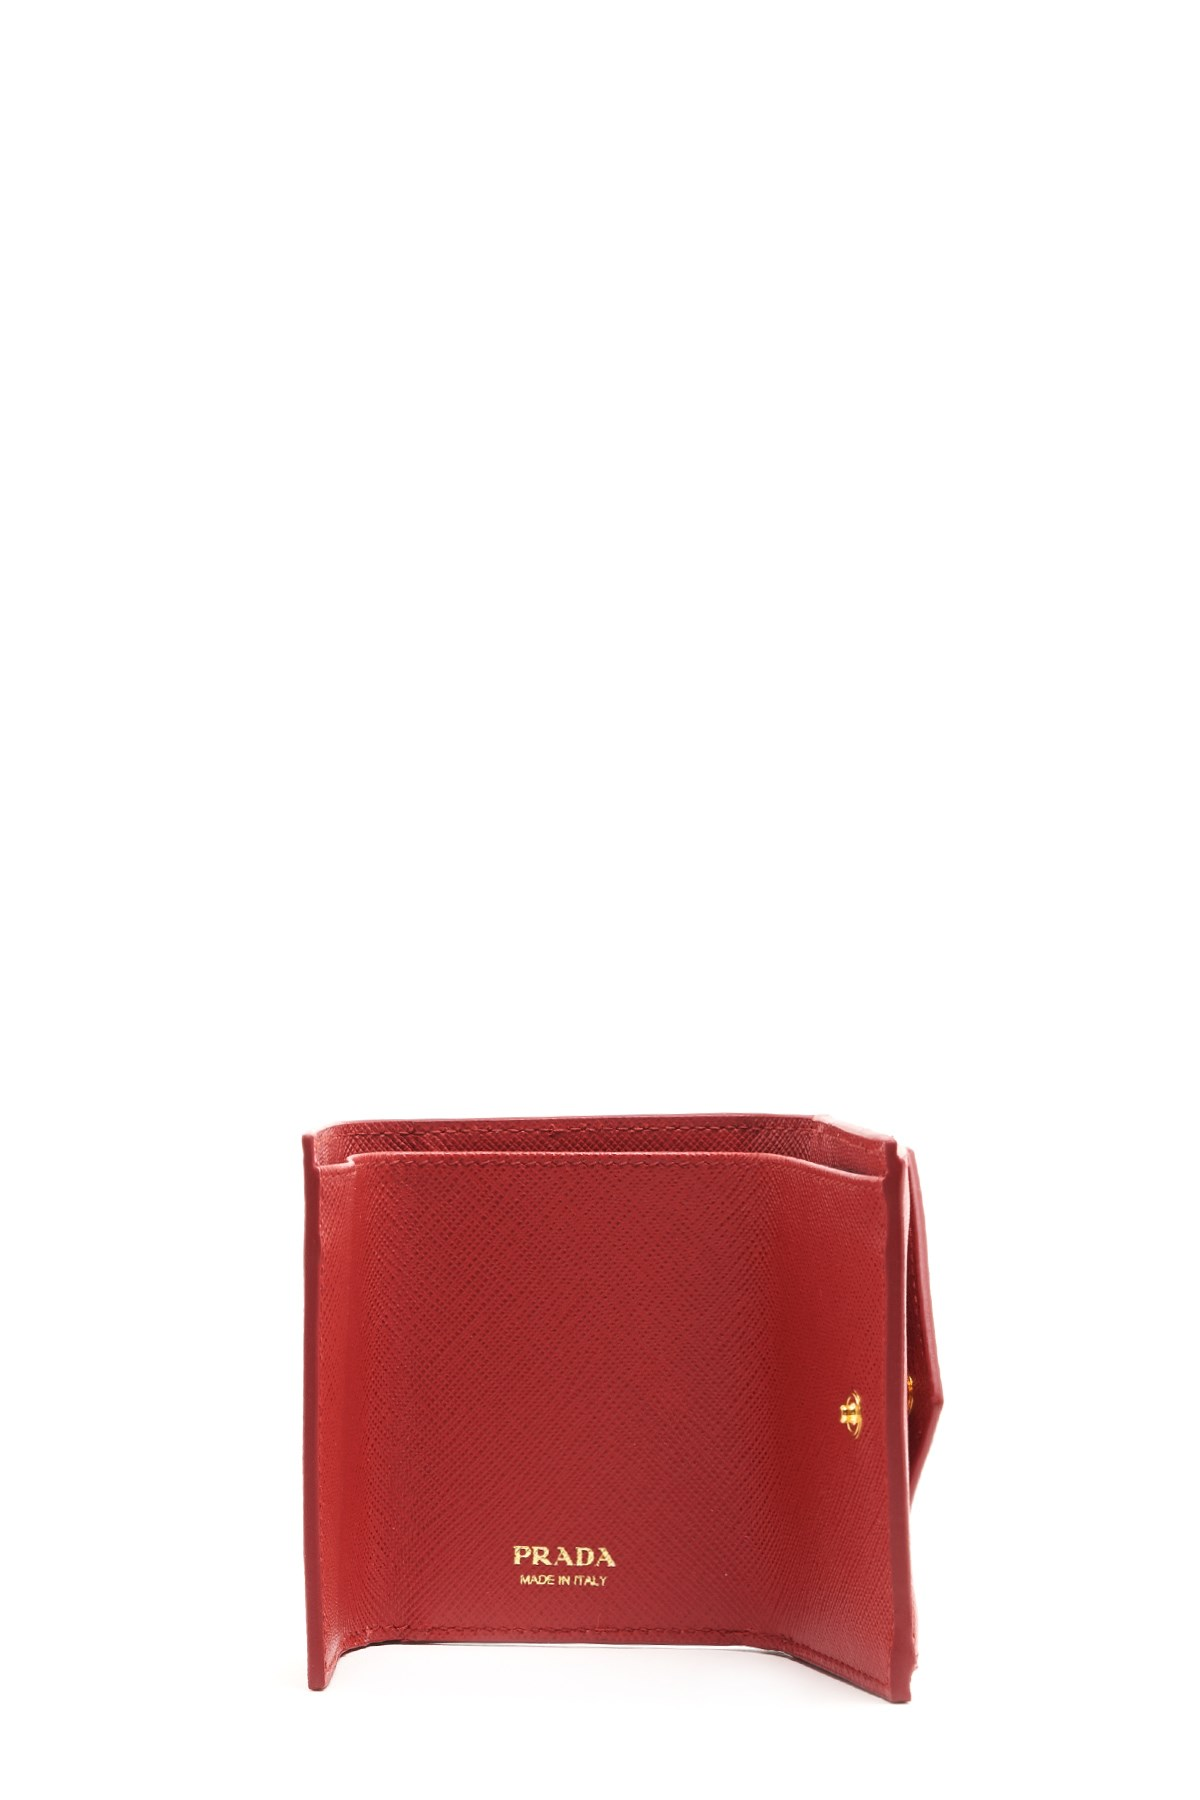 3787434b04a4 prada mini wallet available on julian-fashion.com - 62047